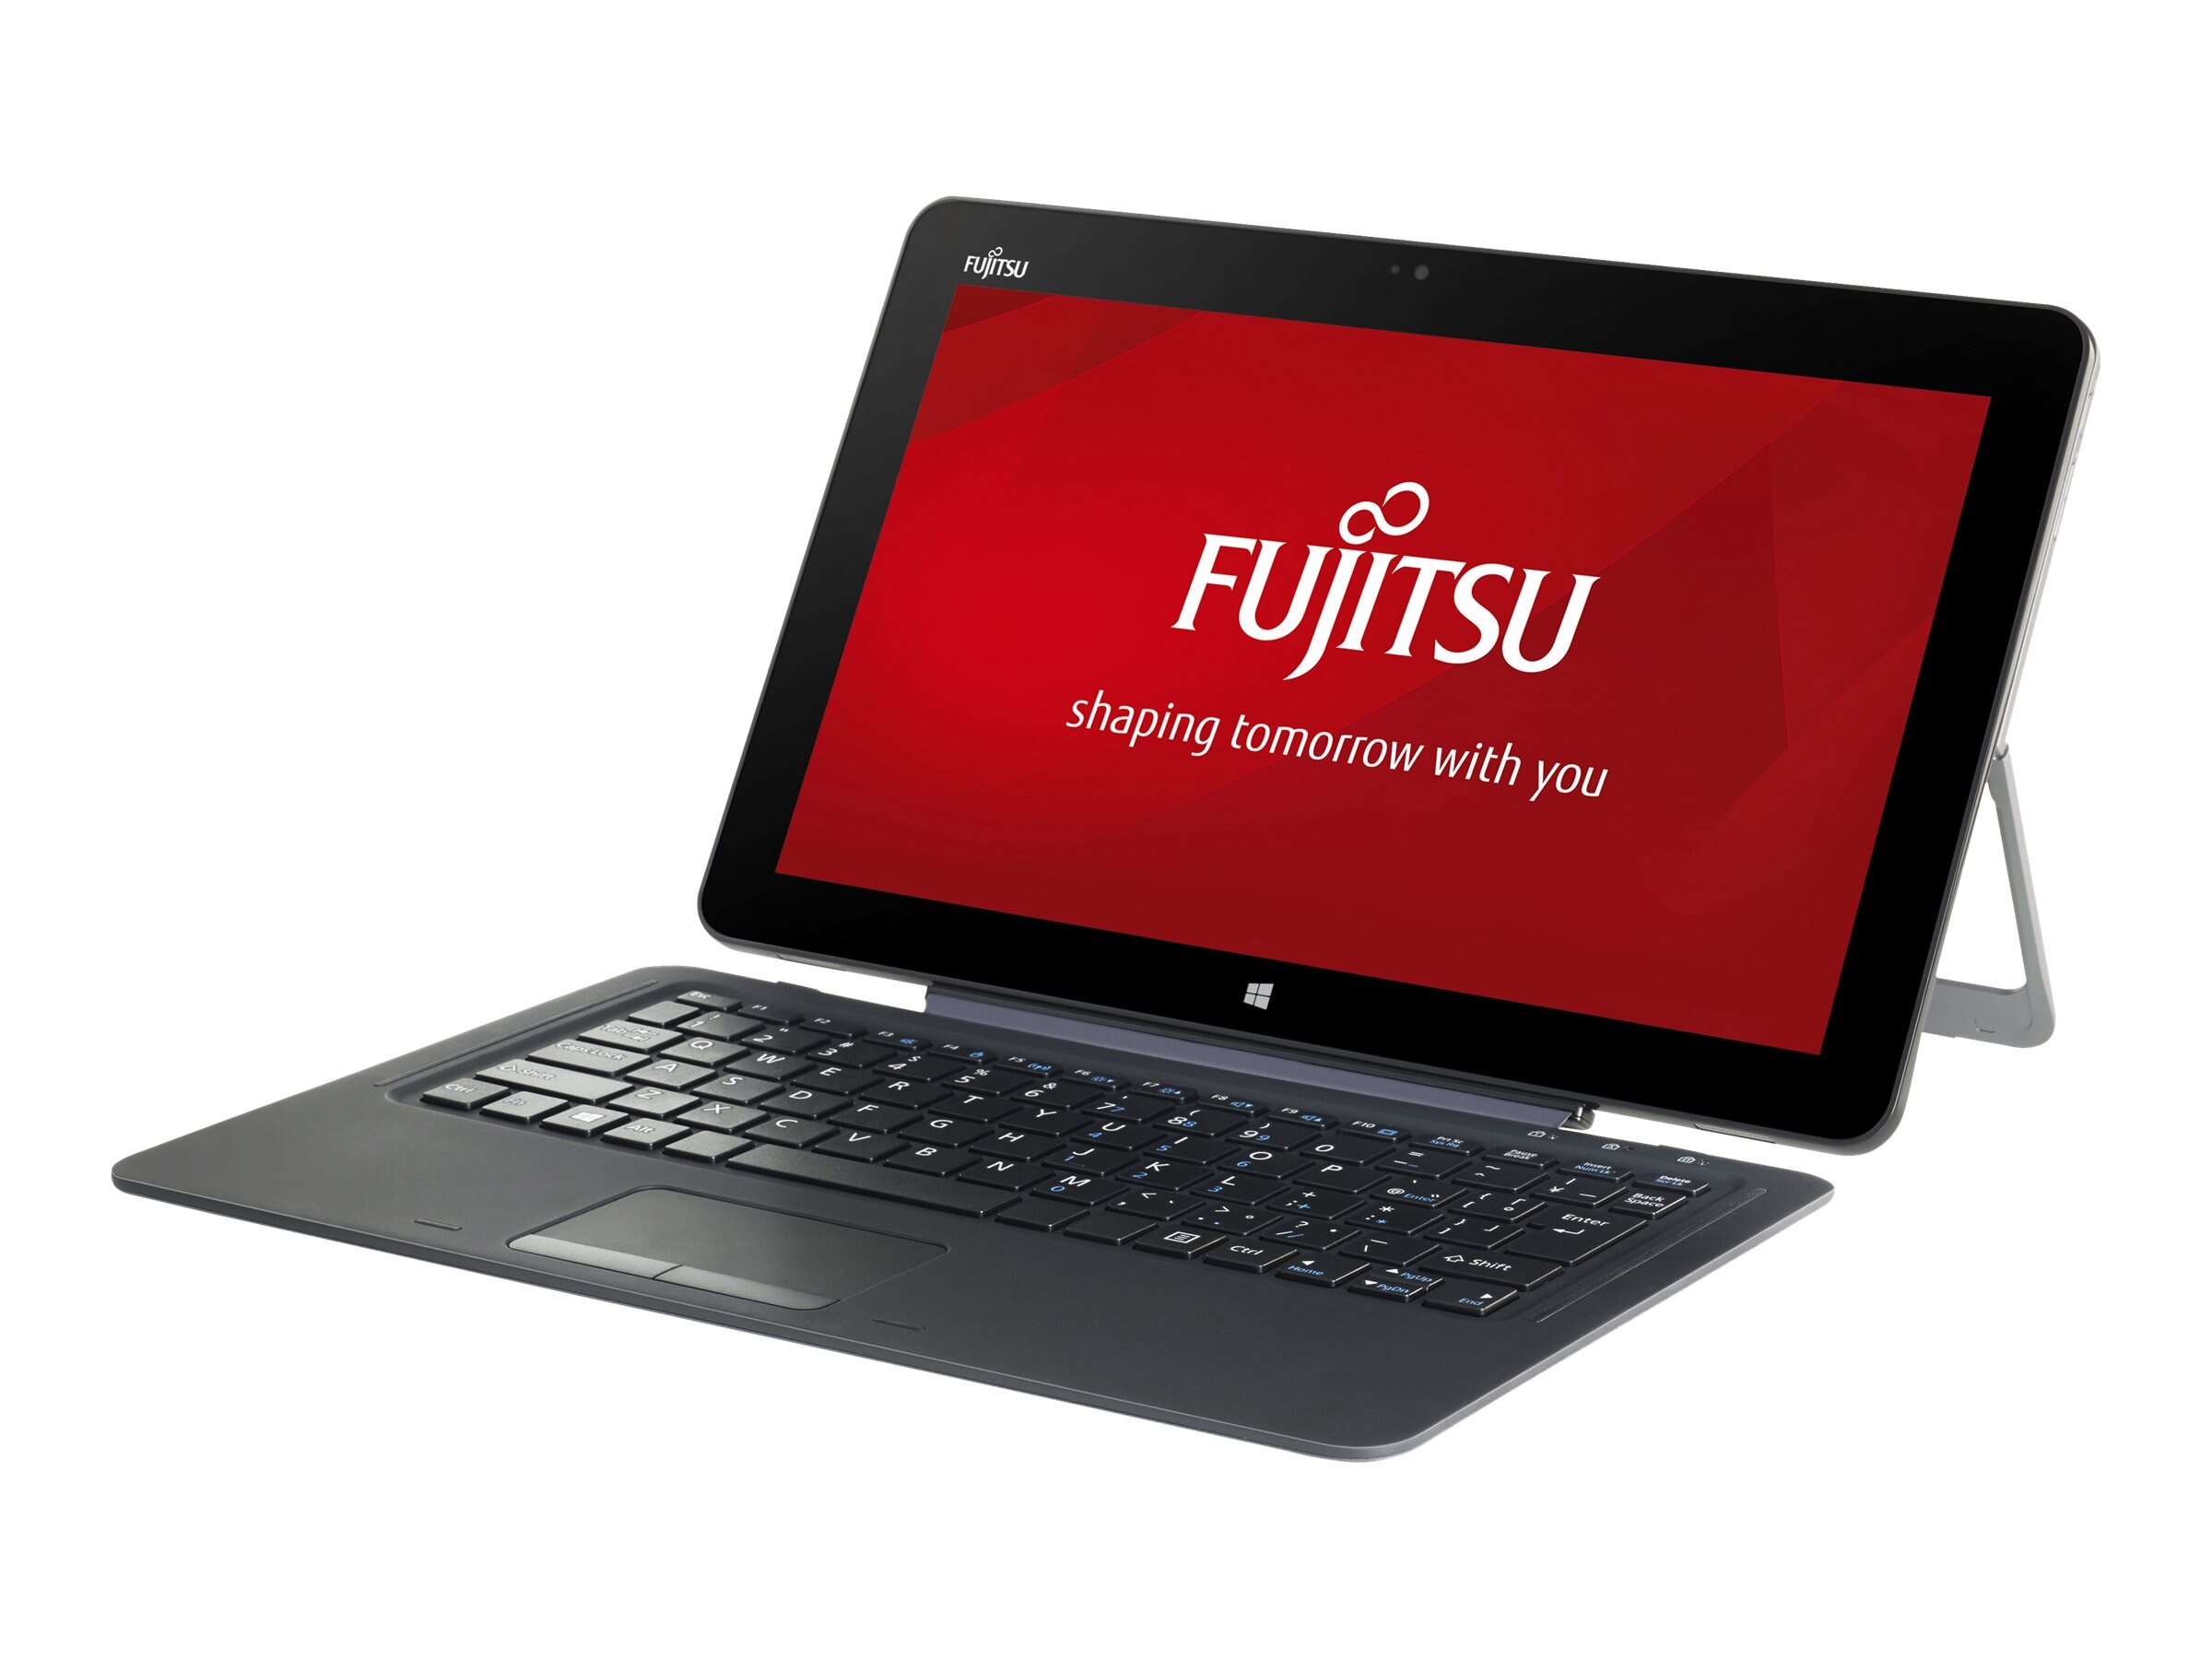 Fujitsu SPFC-R726-W10-002 Image 2